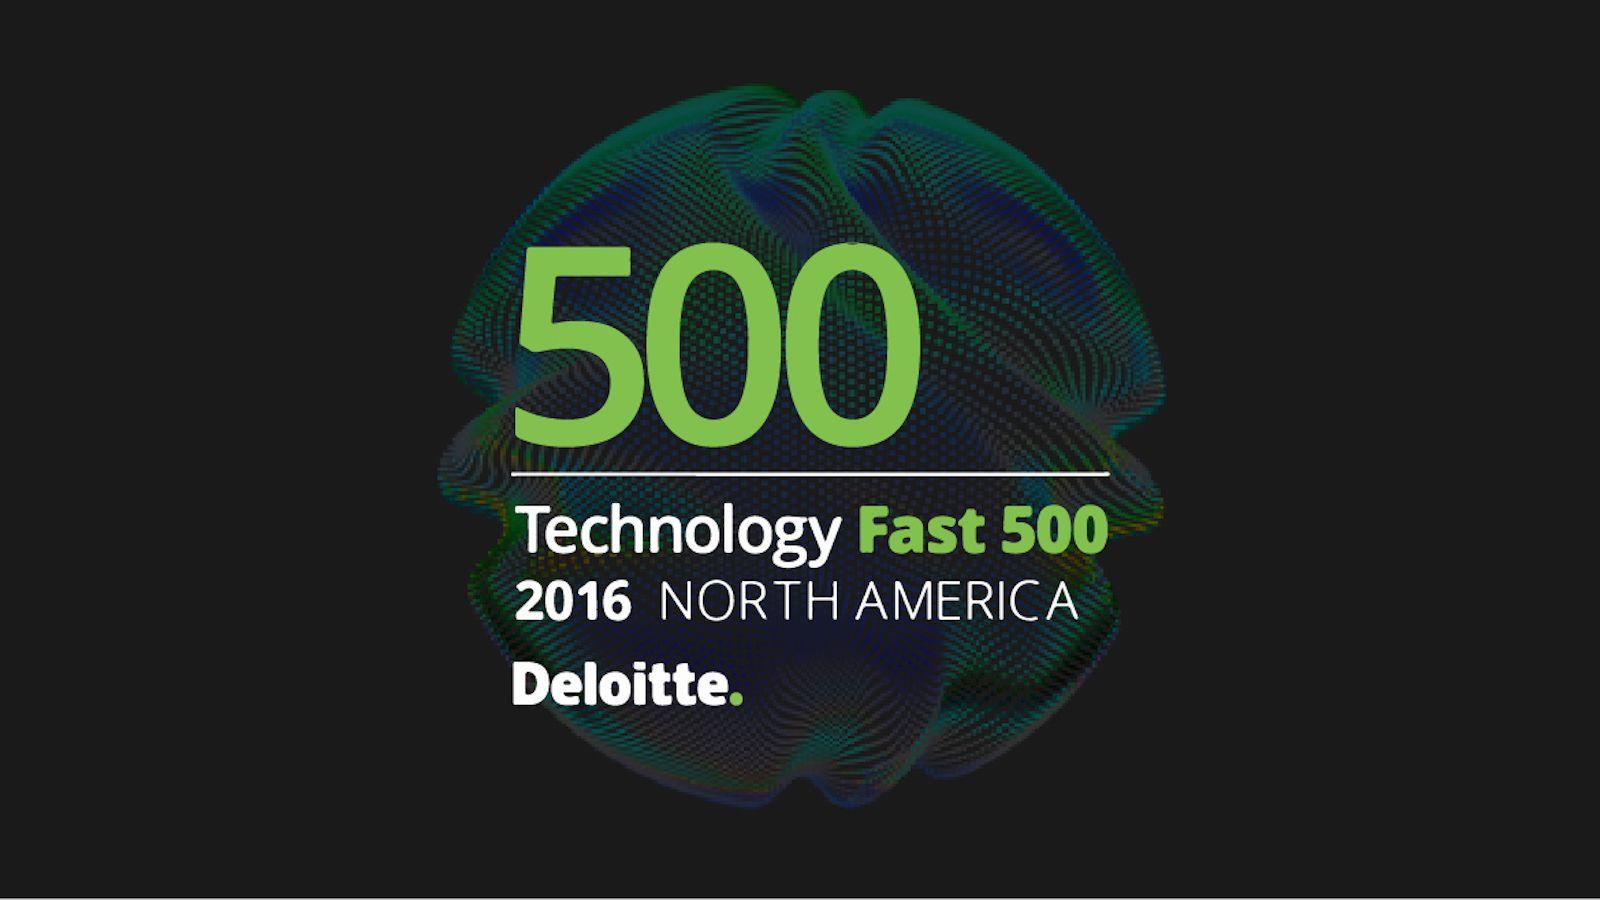 Fast 500 Technologies-North america